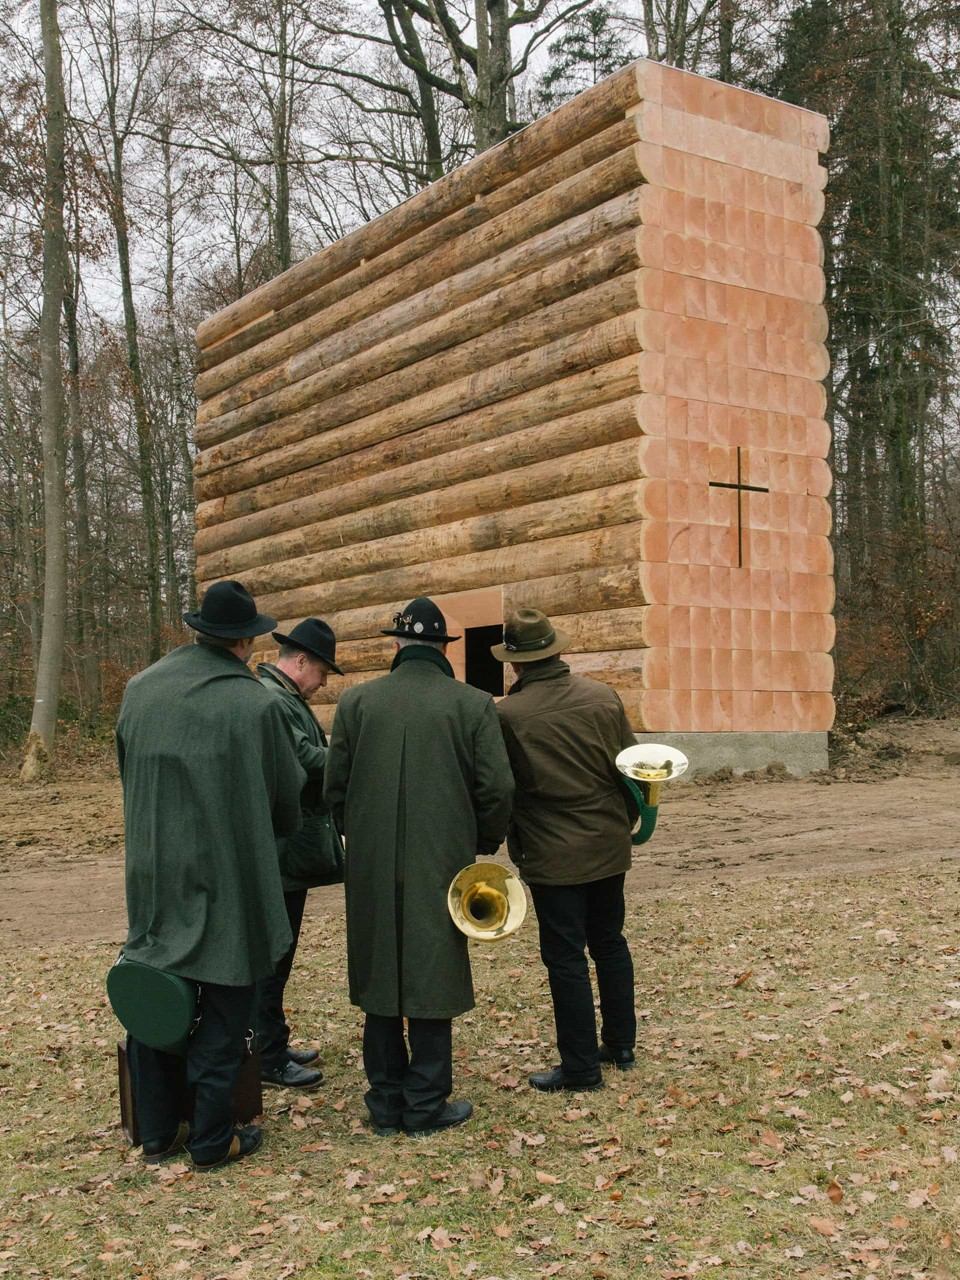 chapel-blessing_john-pawson_dinesen_bayern-germany.jpg